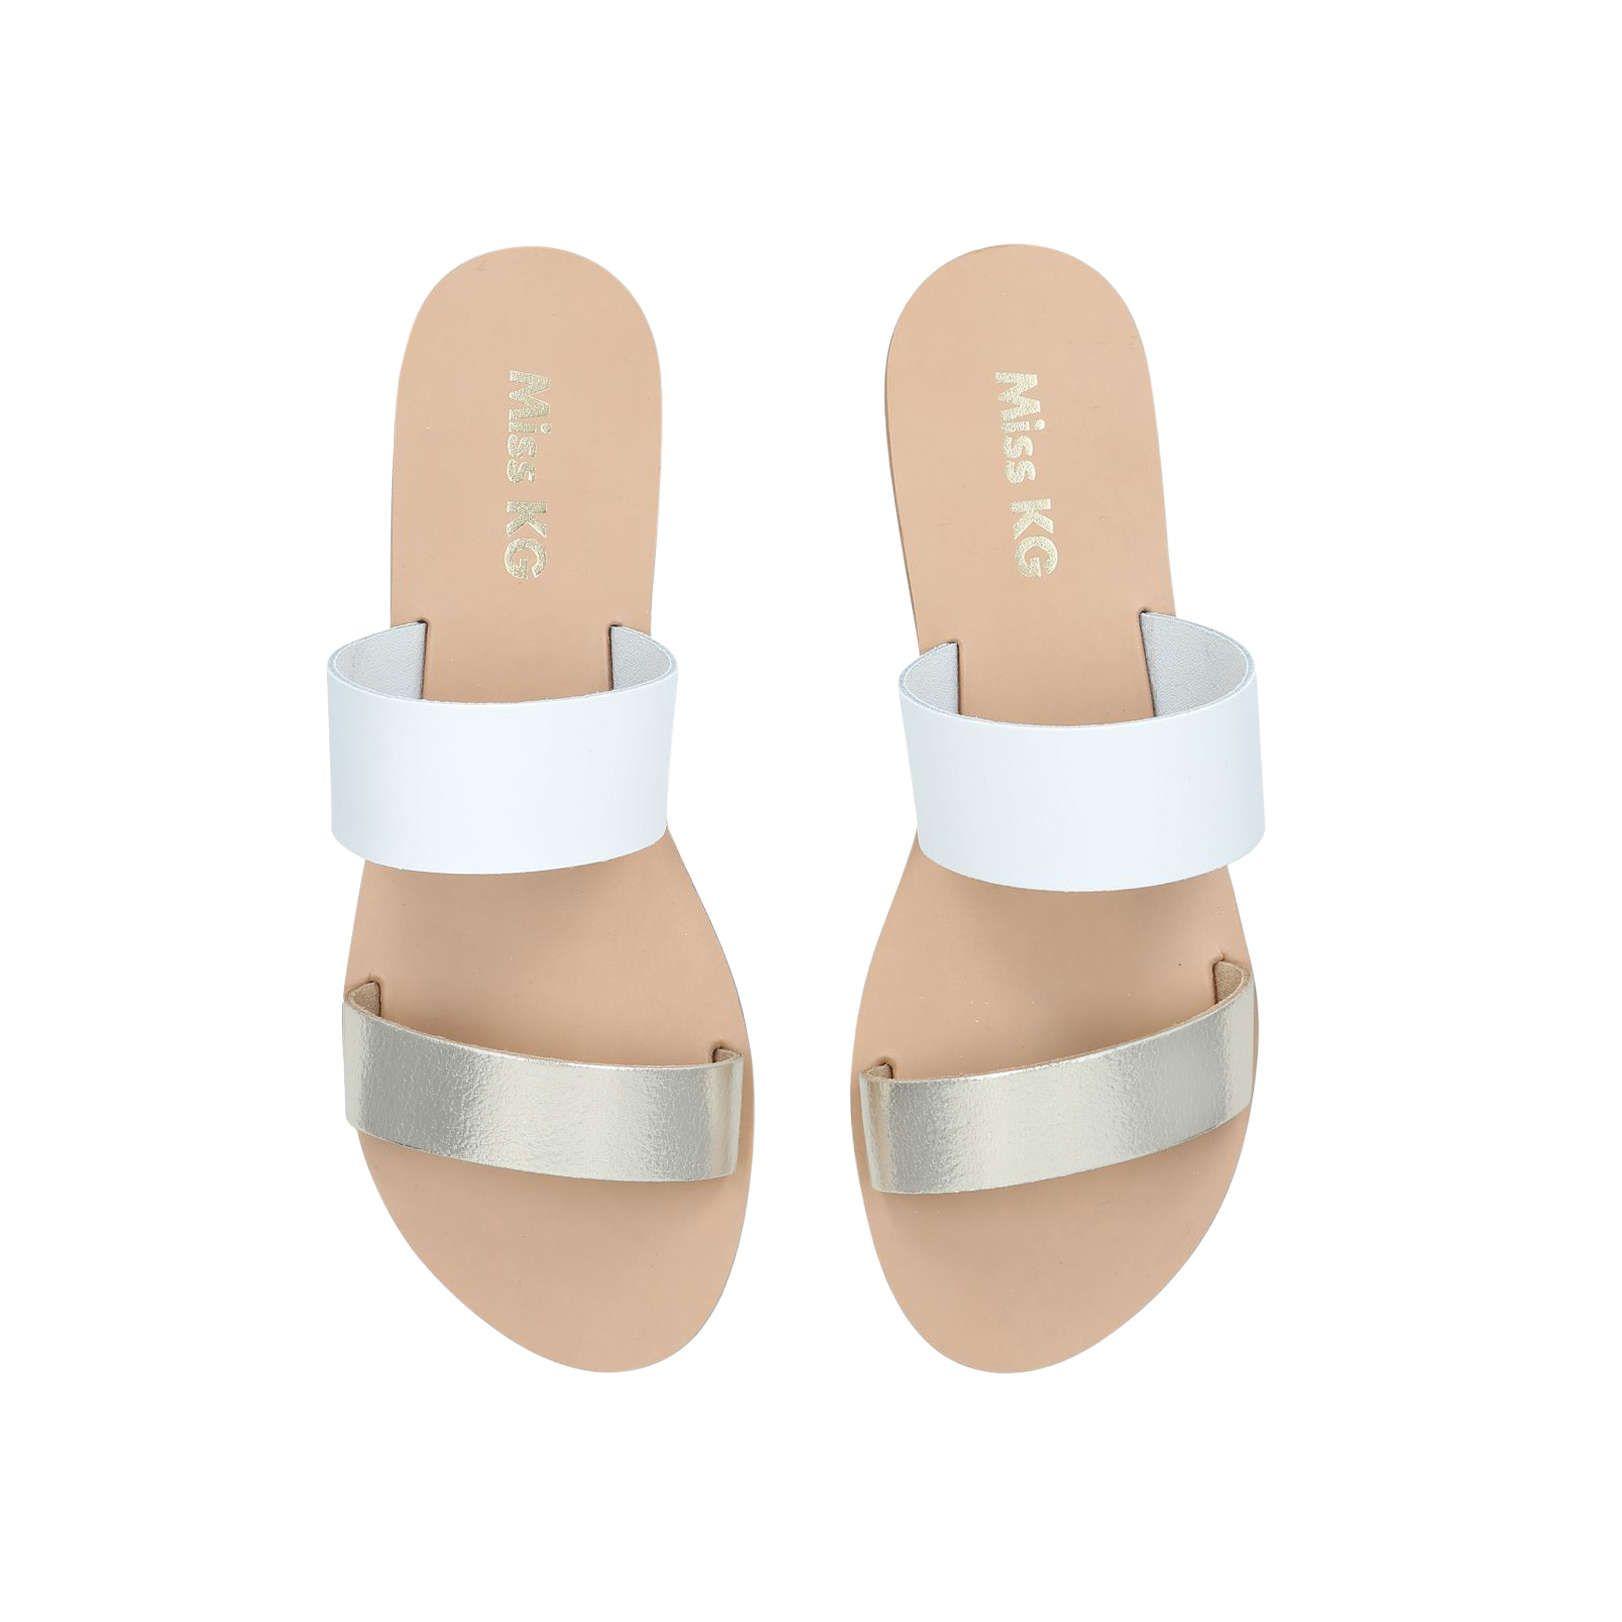 ideas   wedding shoes, shoes